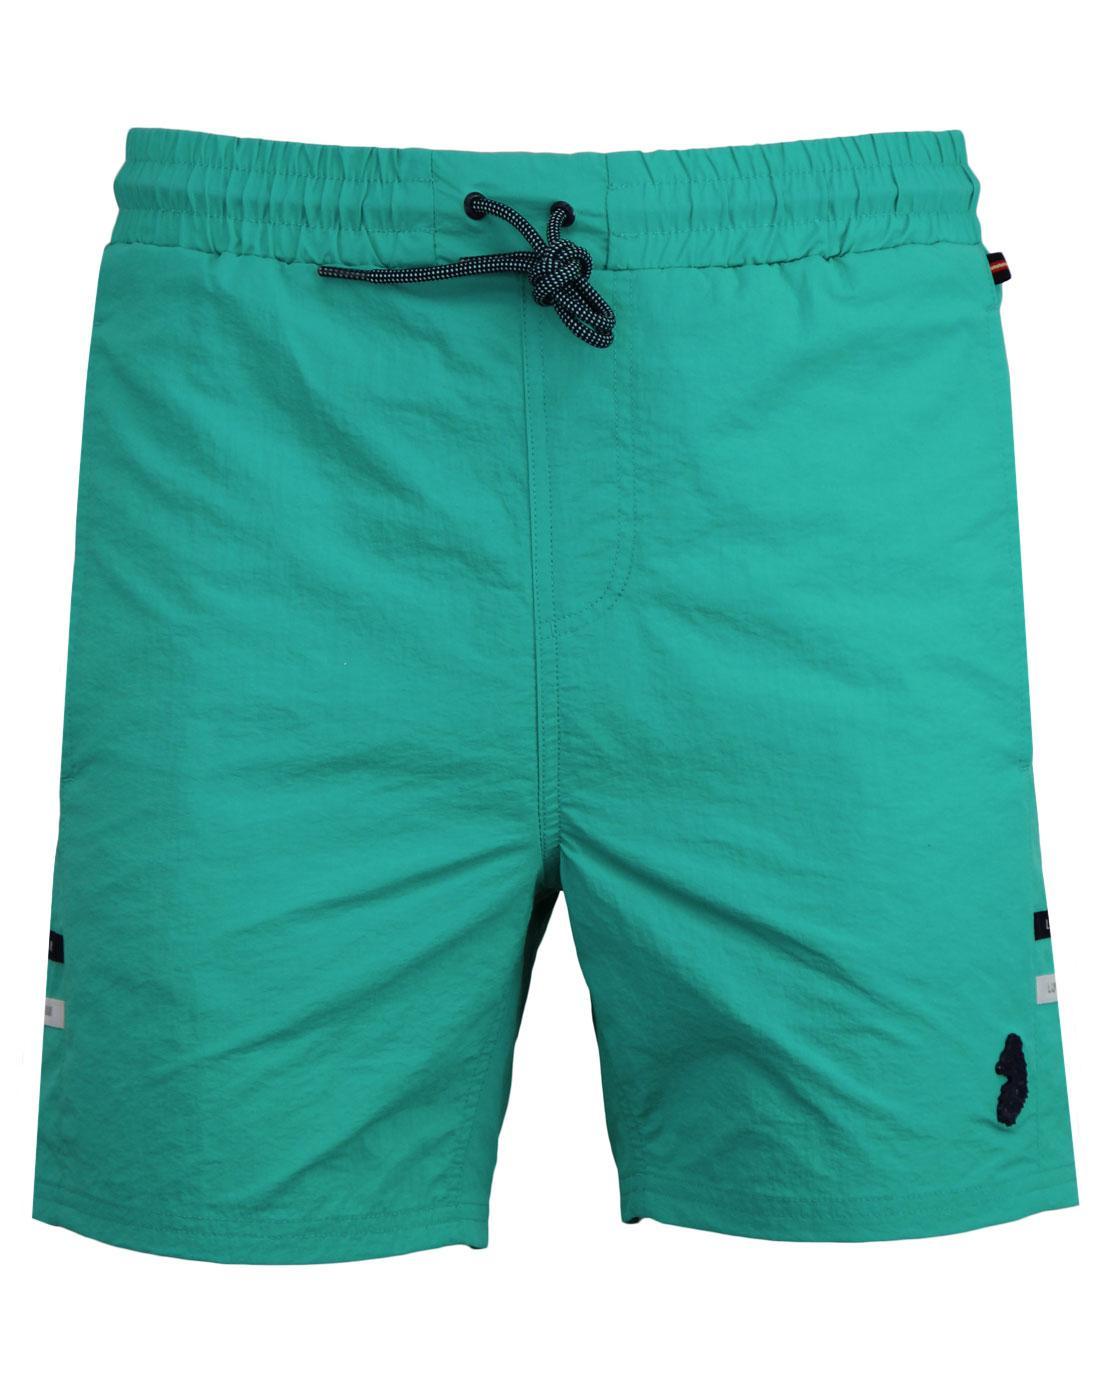 Ragy LUKE 1977 Mens Indie Summer Swim Shorts GREEN